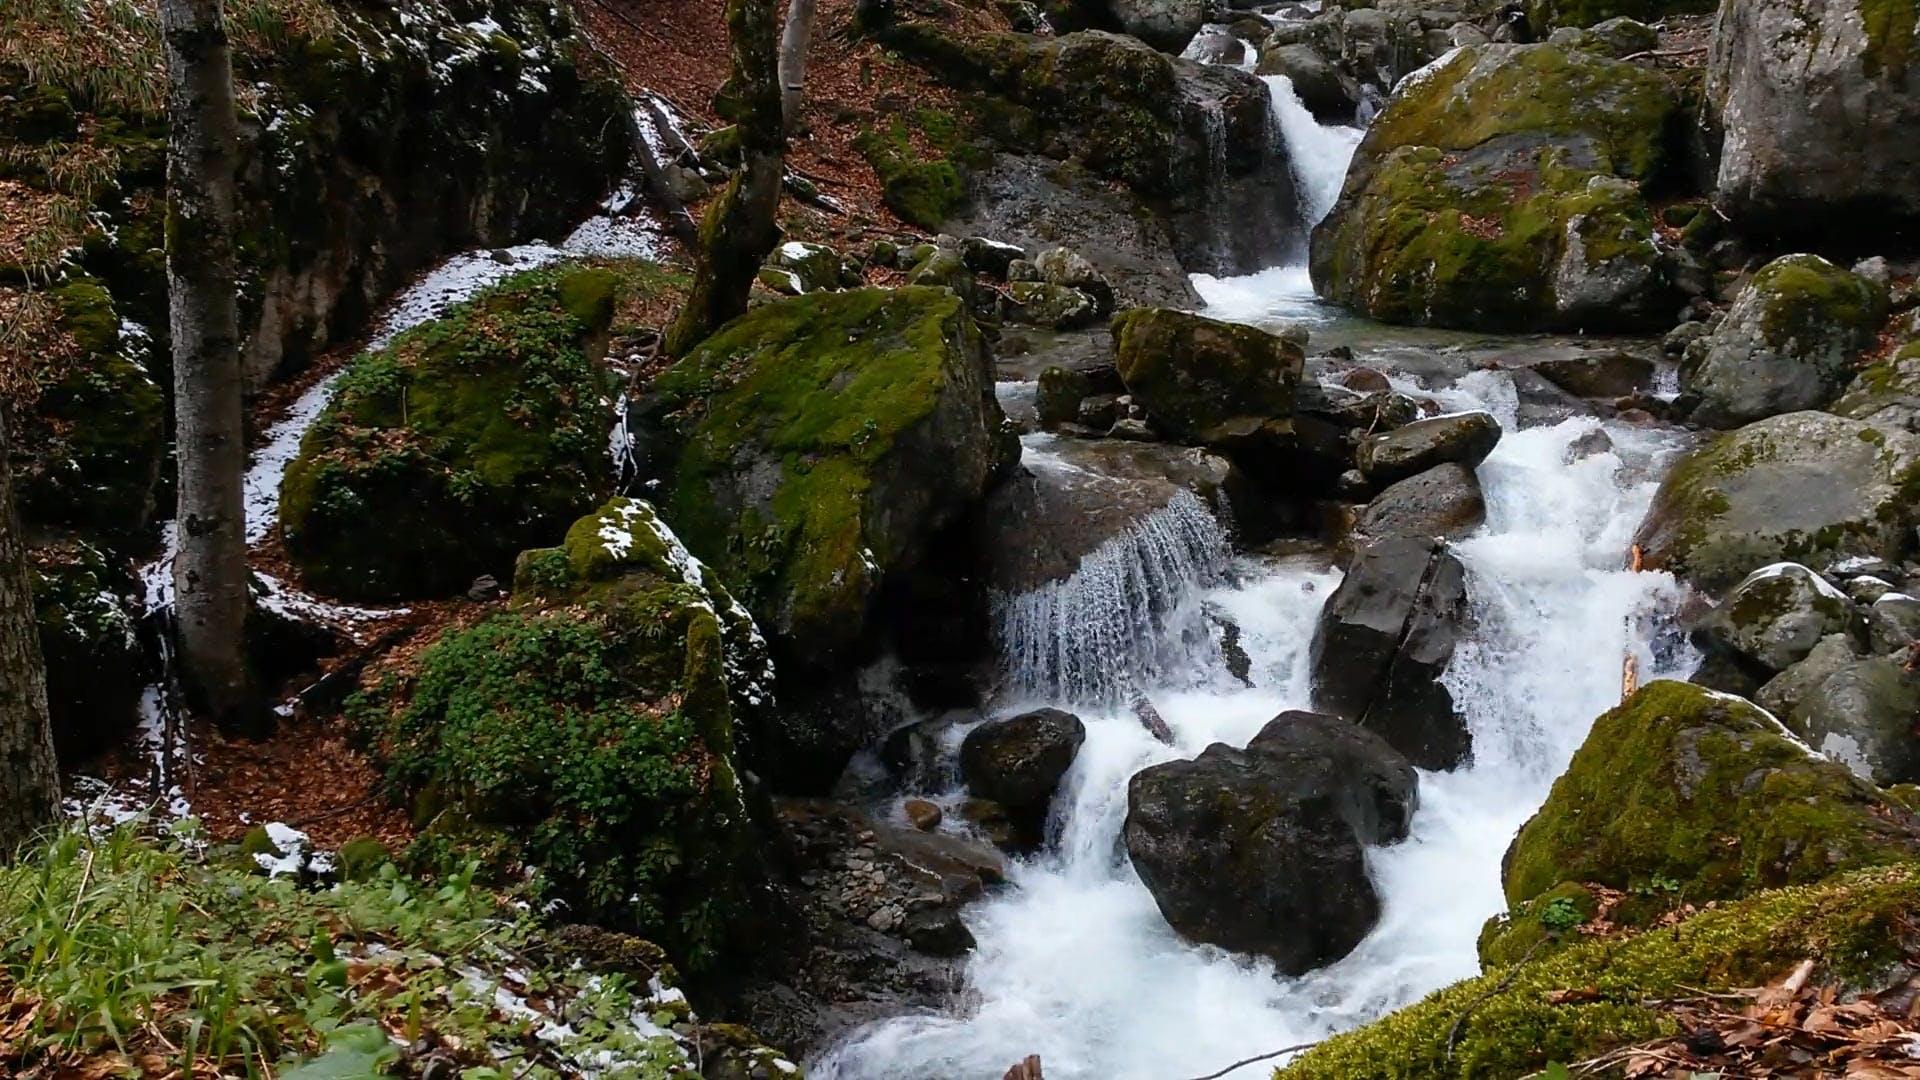 Snow Falling On River Stream